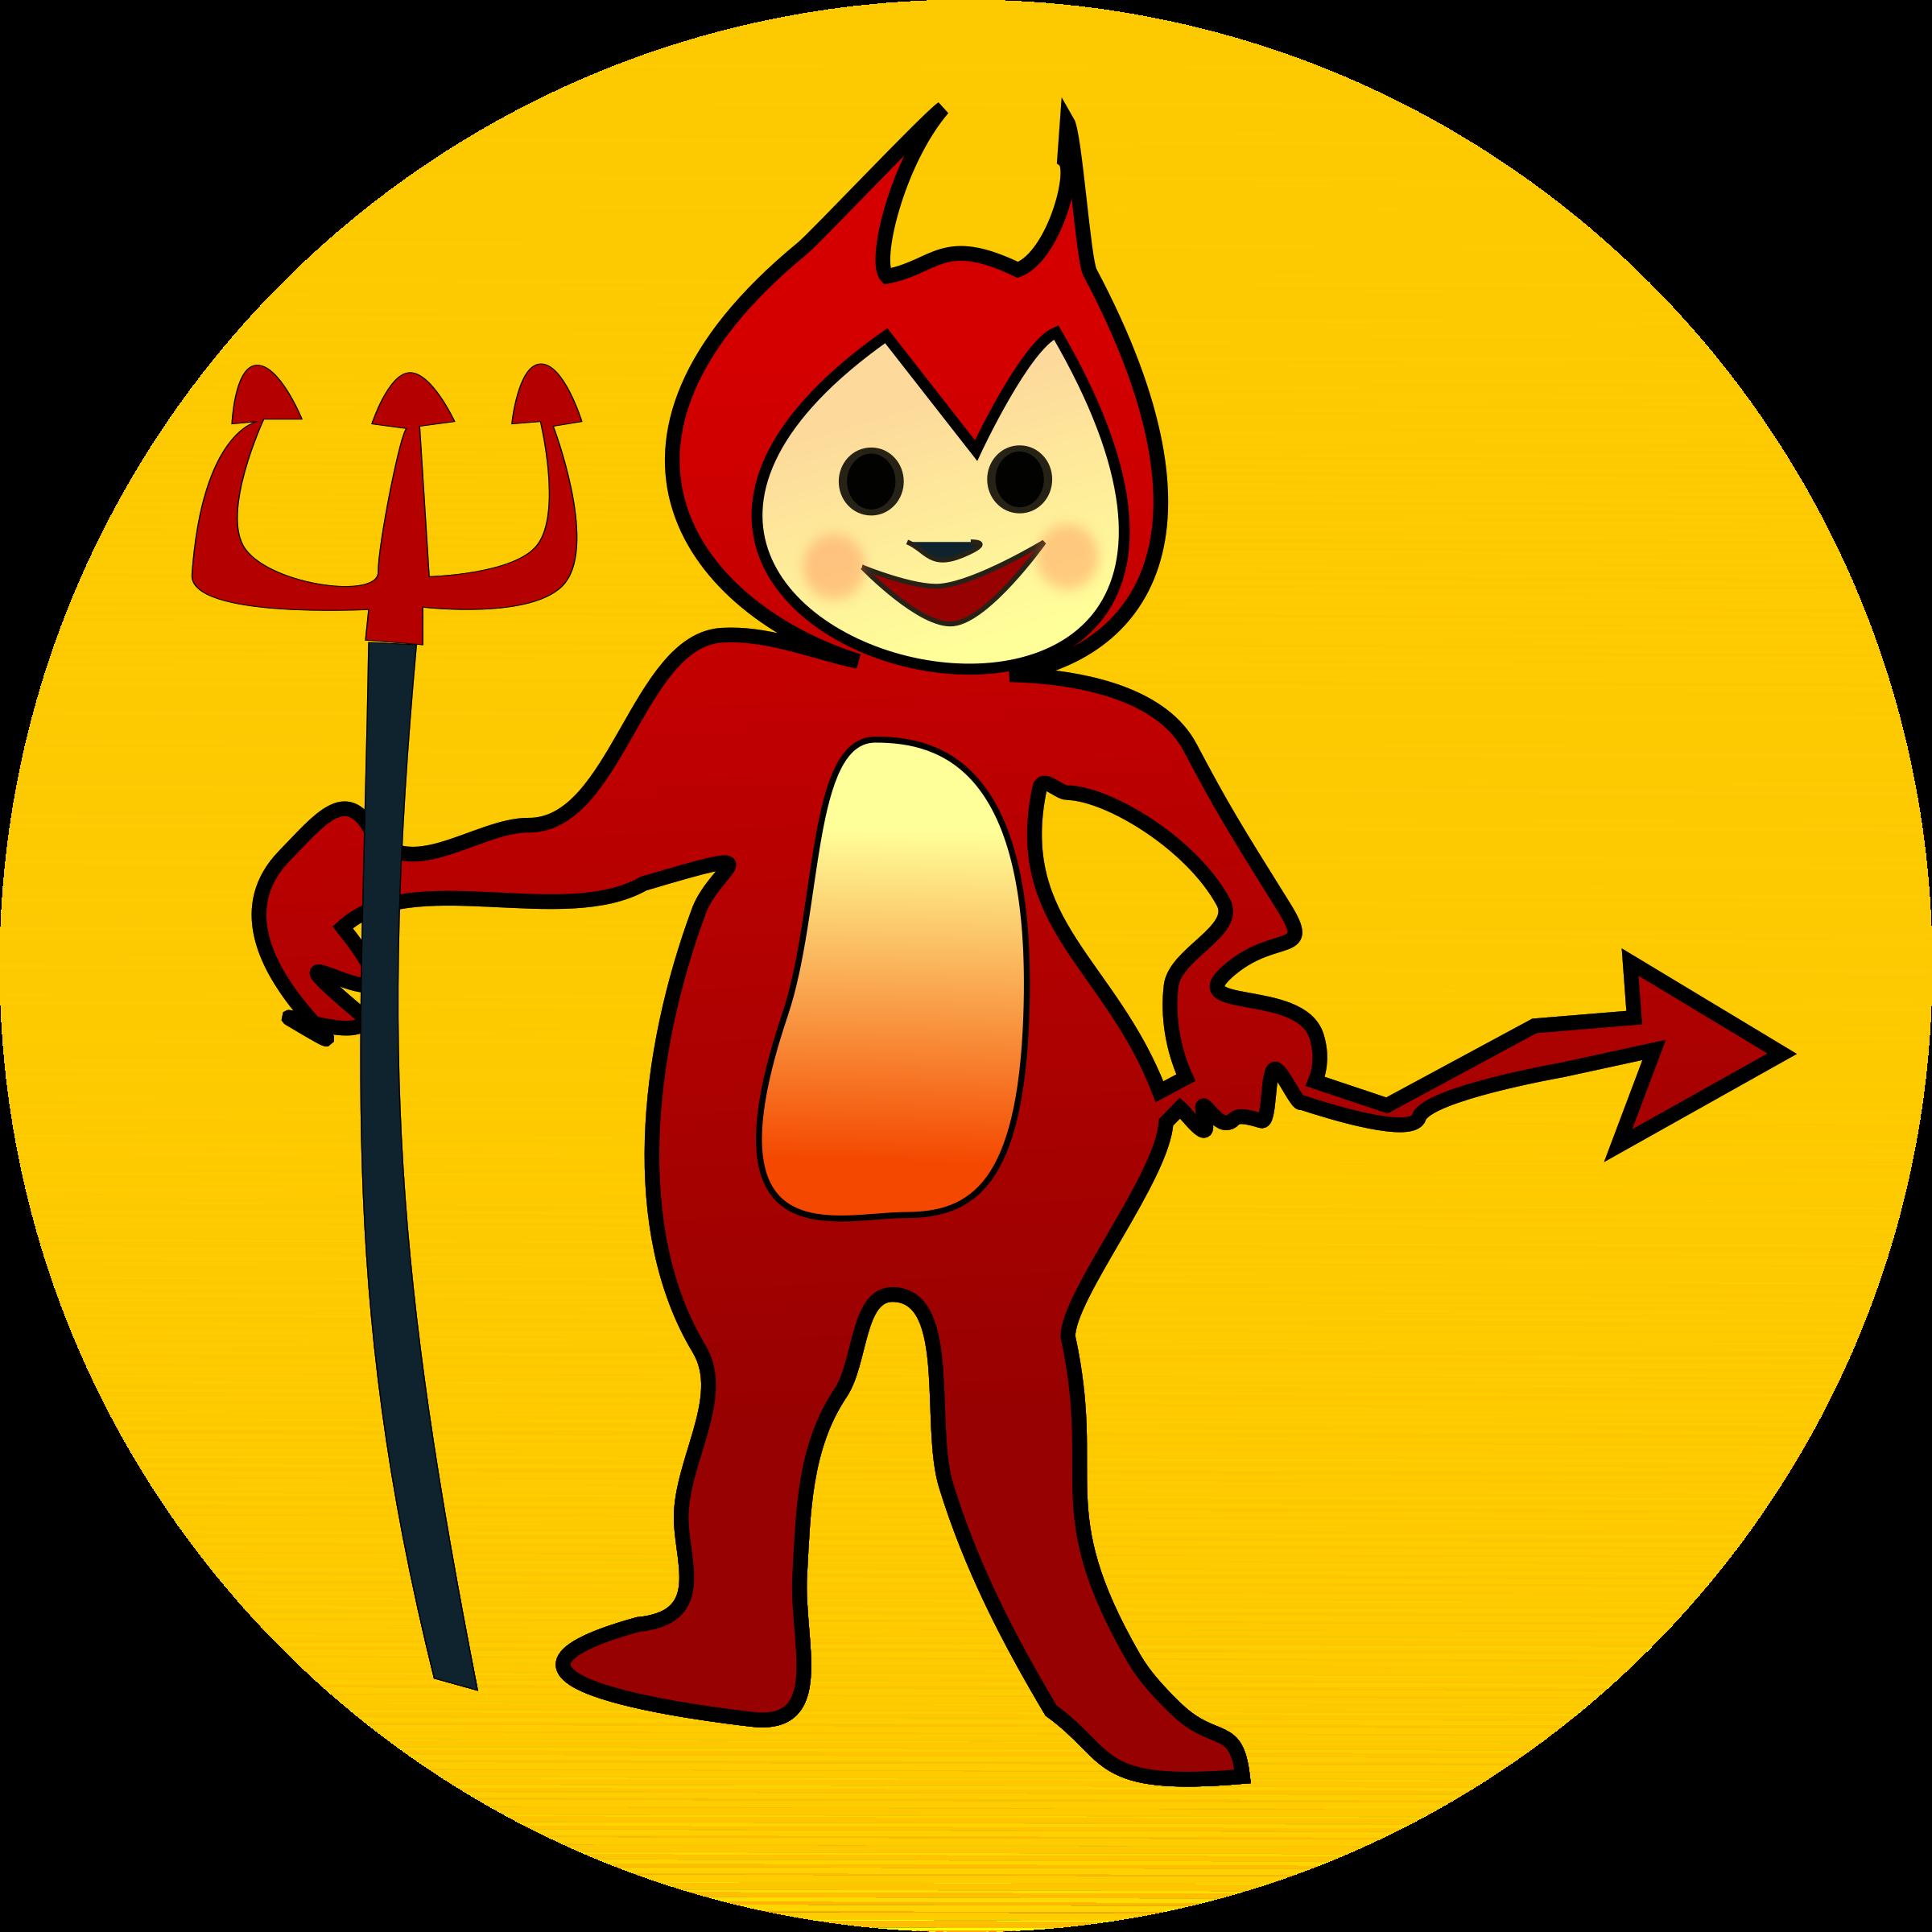 clip art freeuse download Devil clipart. Littel icon big image.